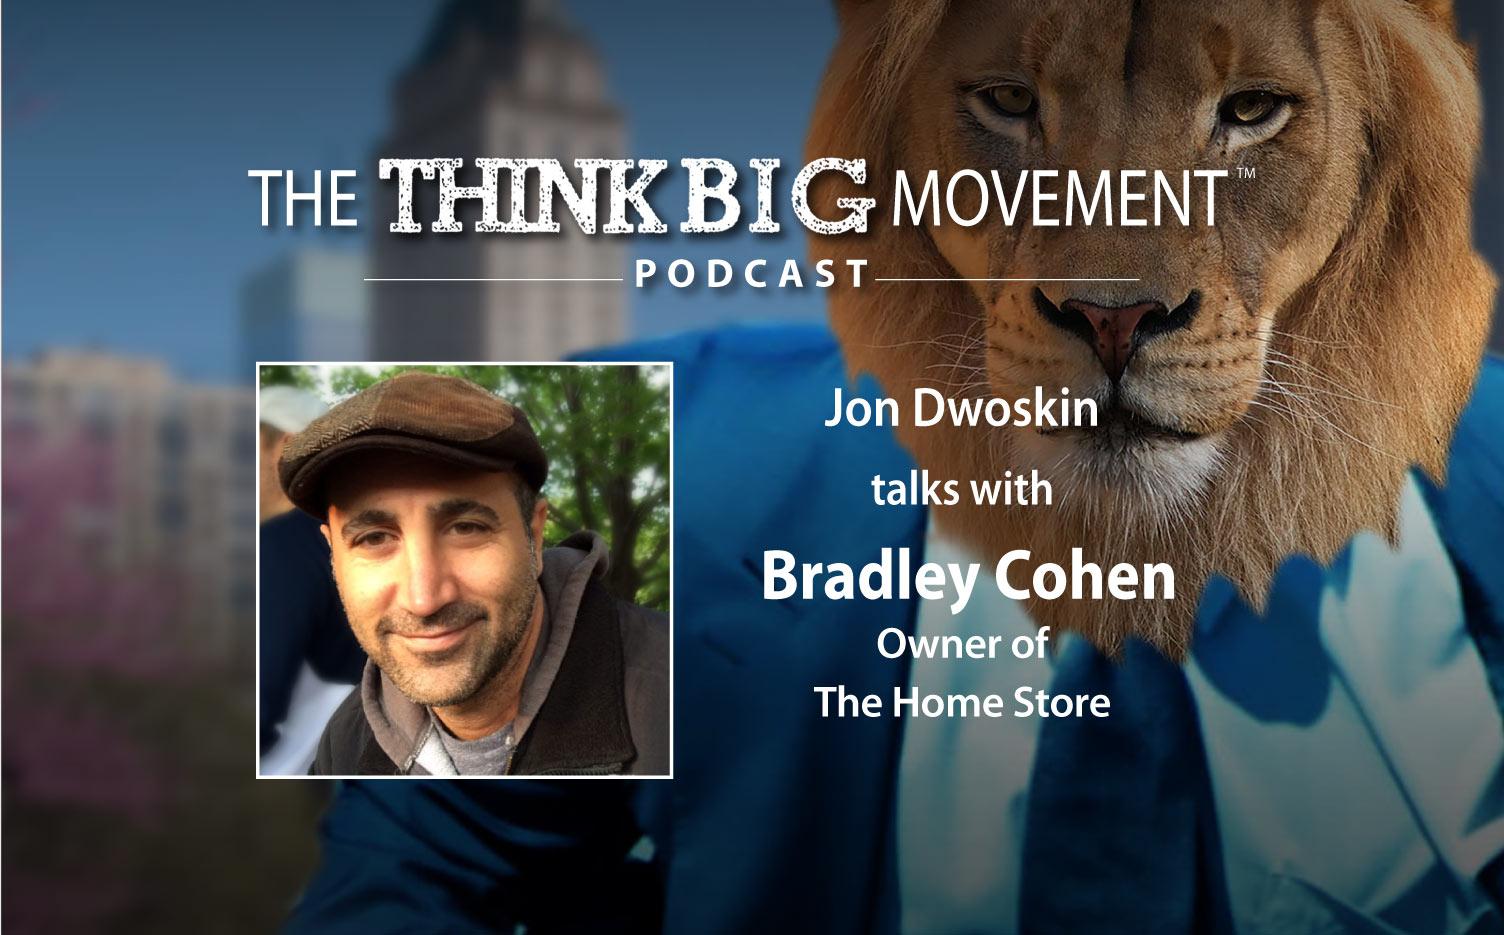 Think Big Movement Podcast - Jon Dwoskin Interviews